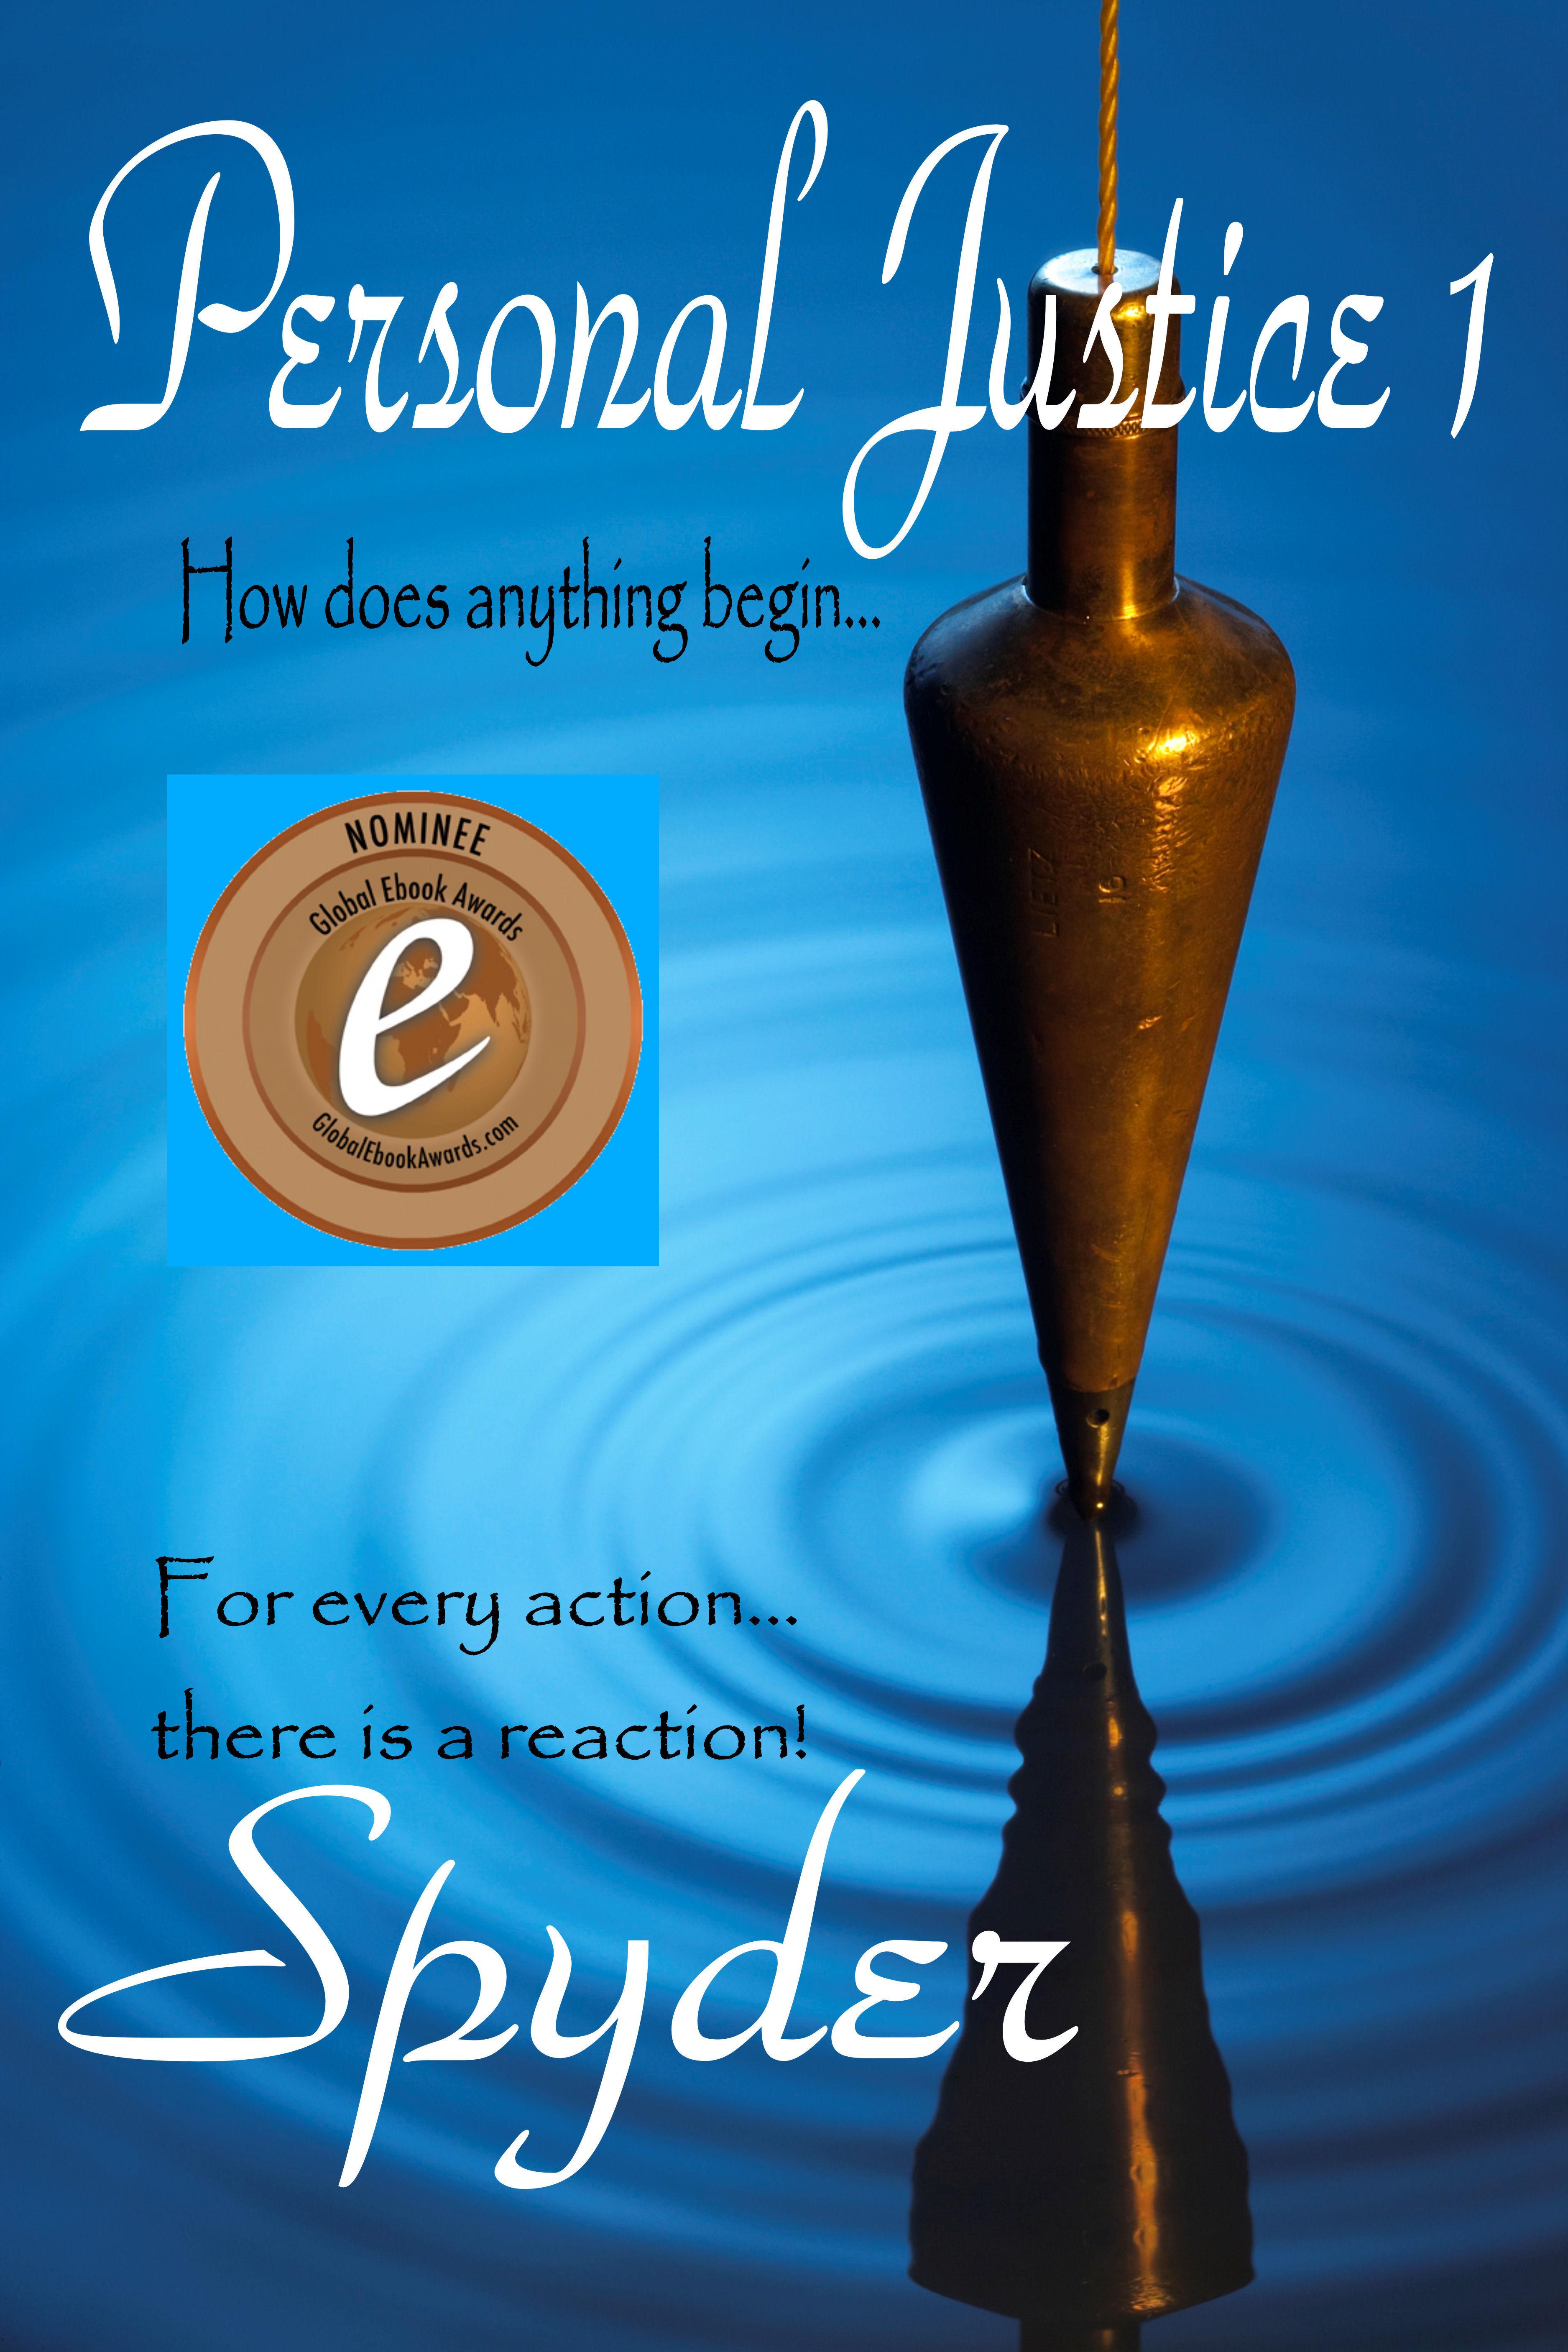 Personal Justice 1 (8 book series)